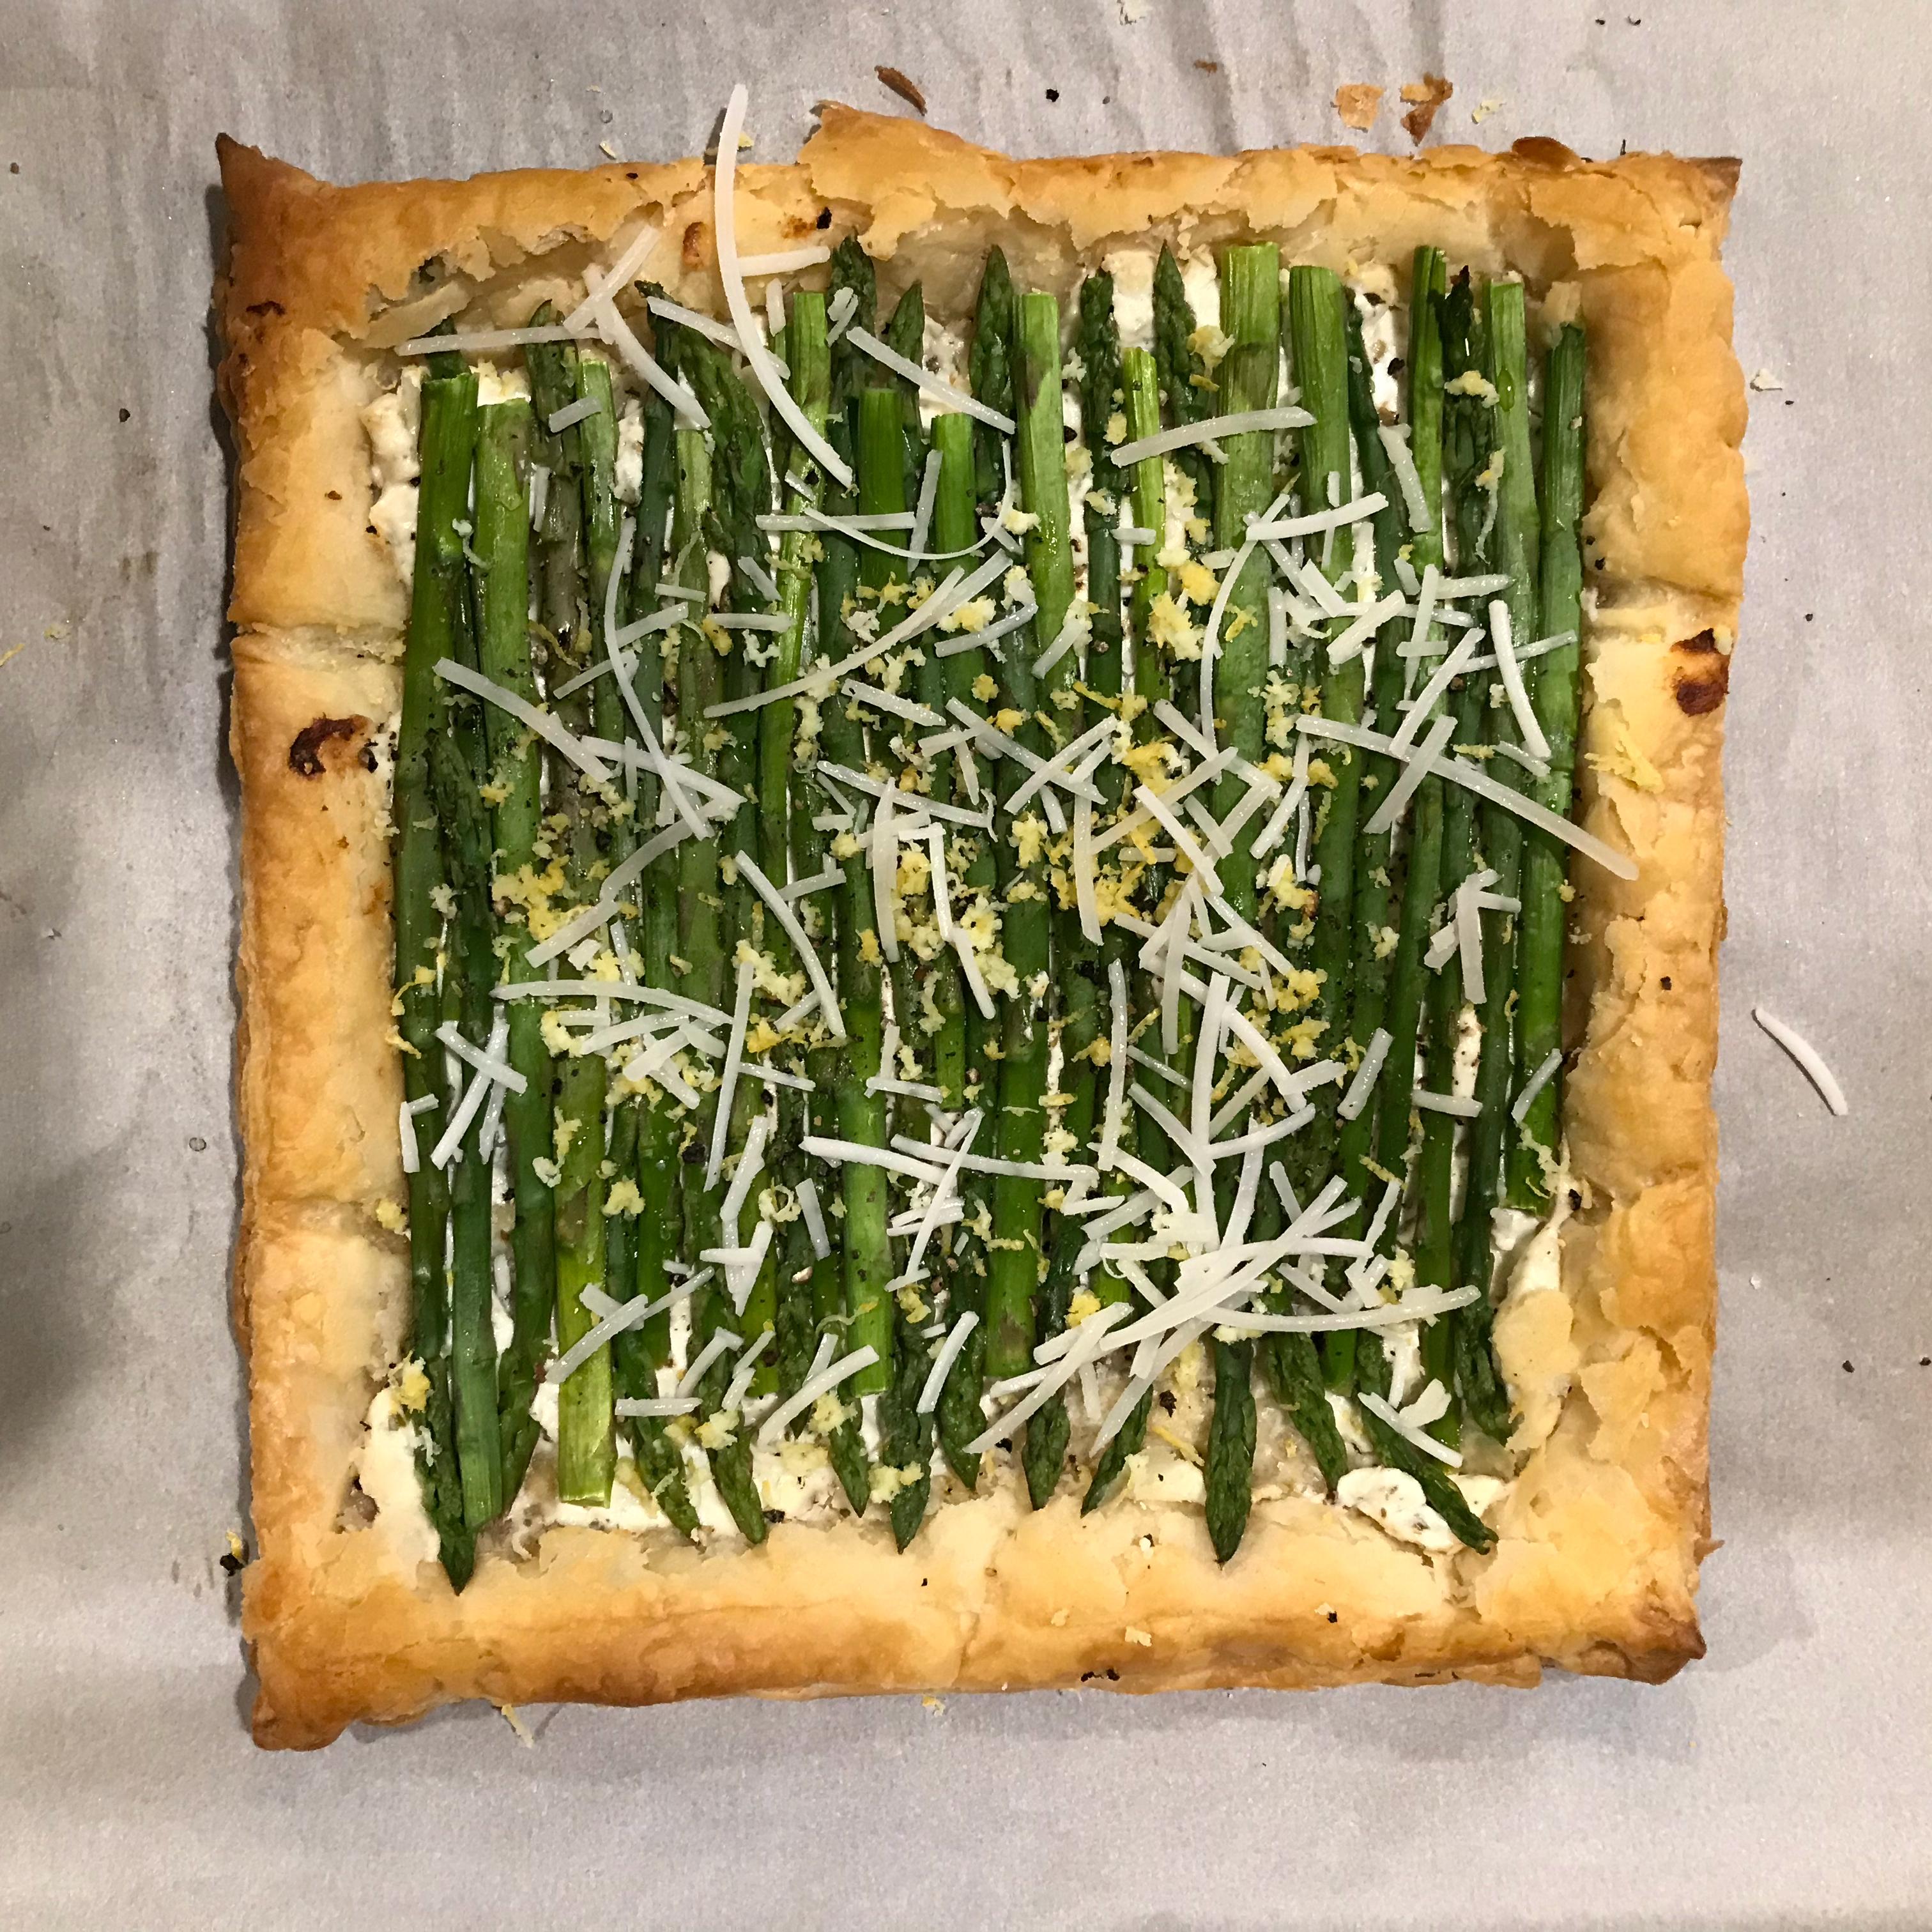 Chef John's Asparagus Tart Elizabeth